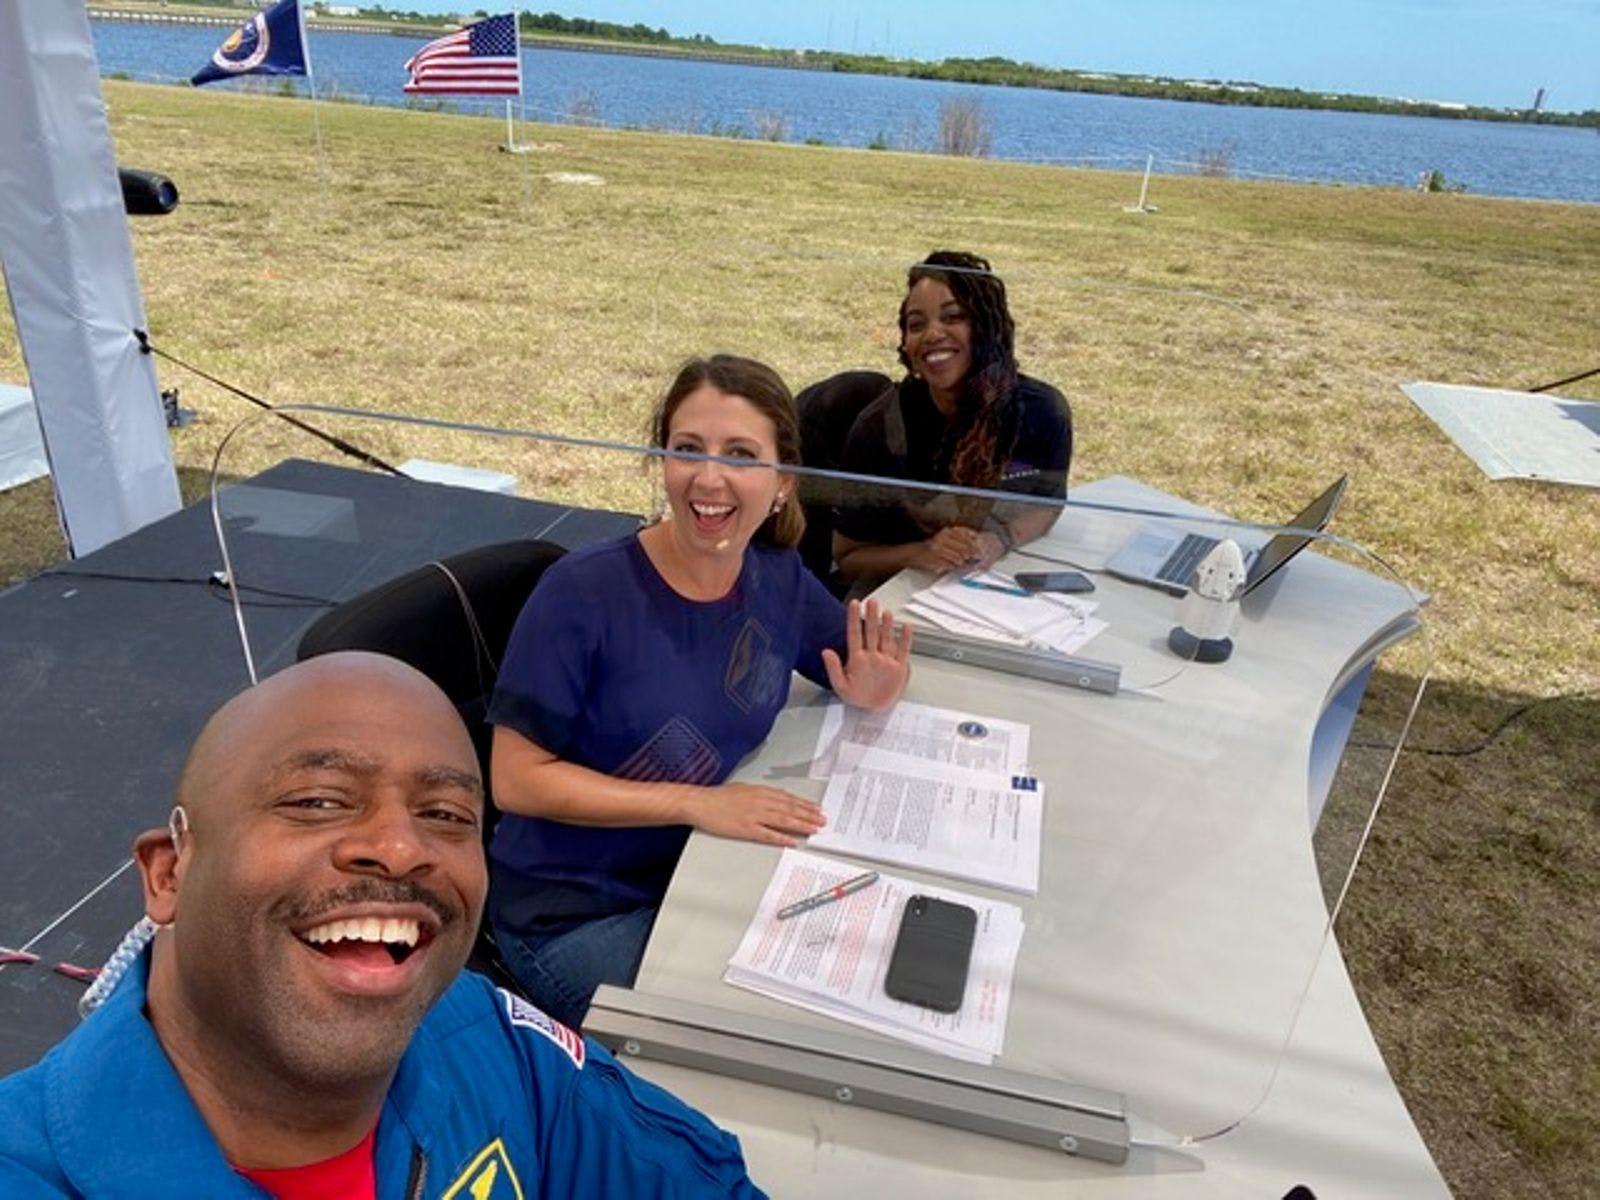 Astronaut Leland Melvin taking a selfie